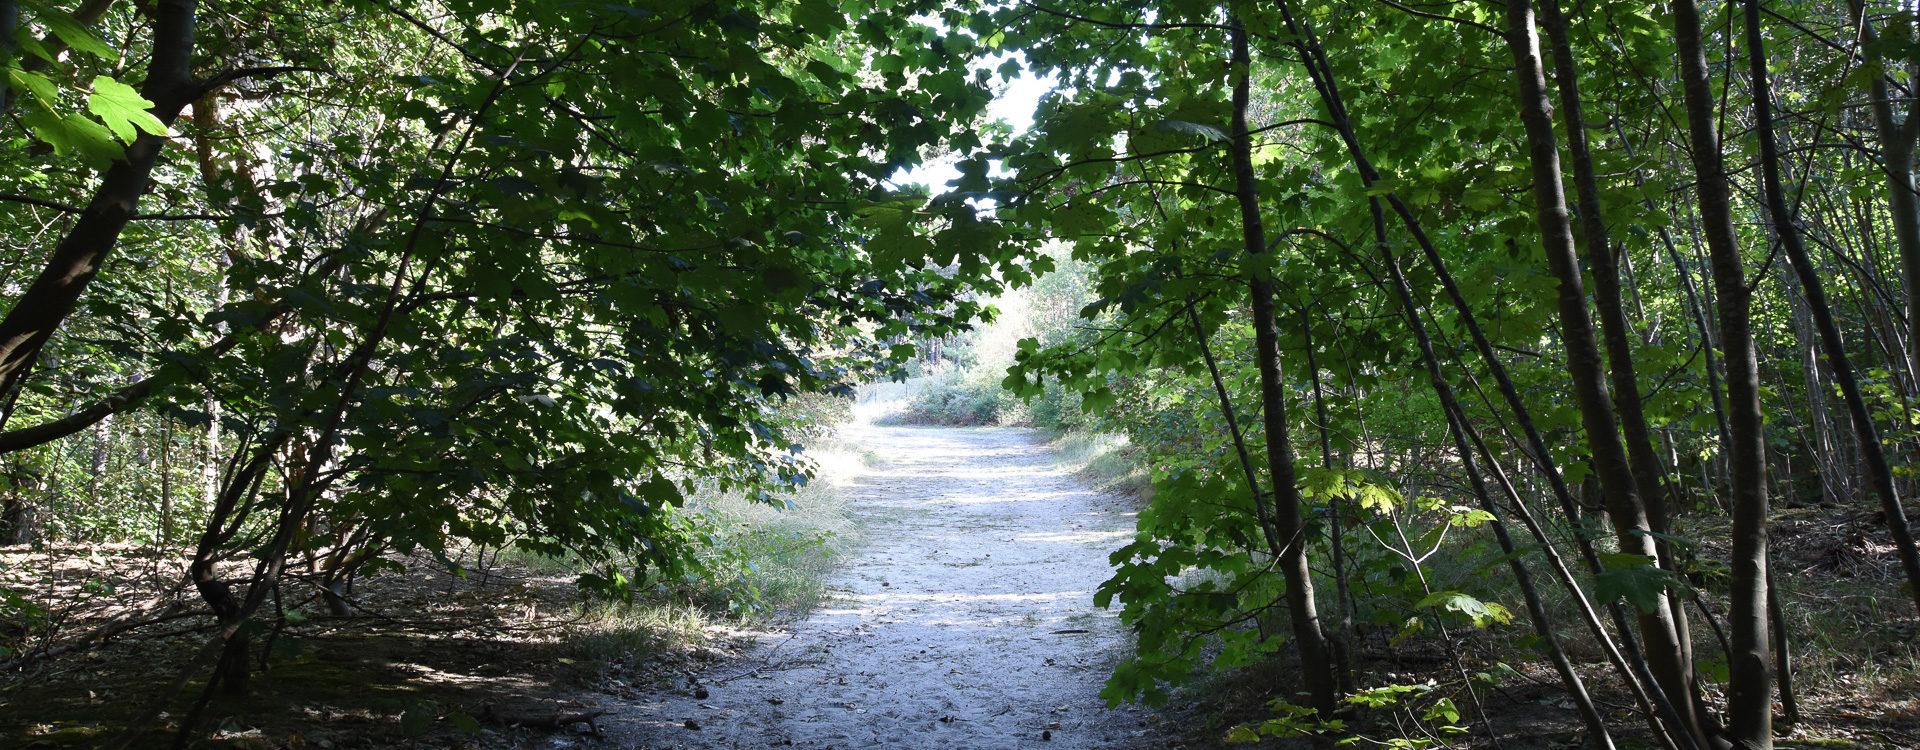 Kampeerverblijfpark Tolmzant - Tolmzant